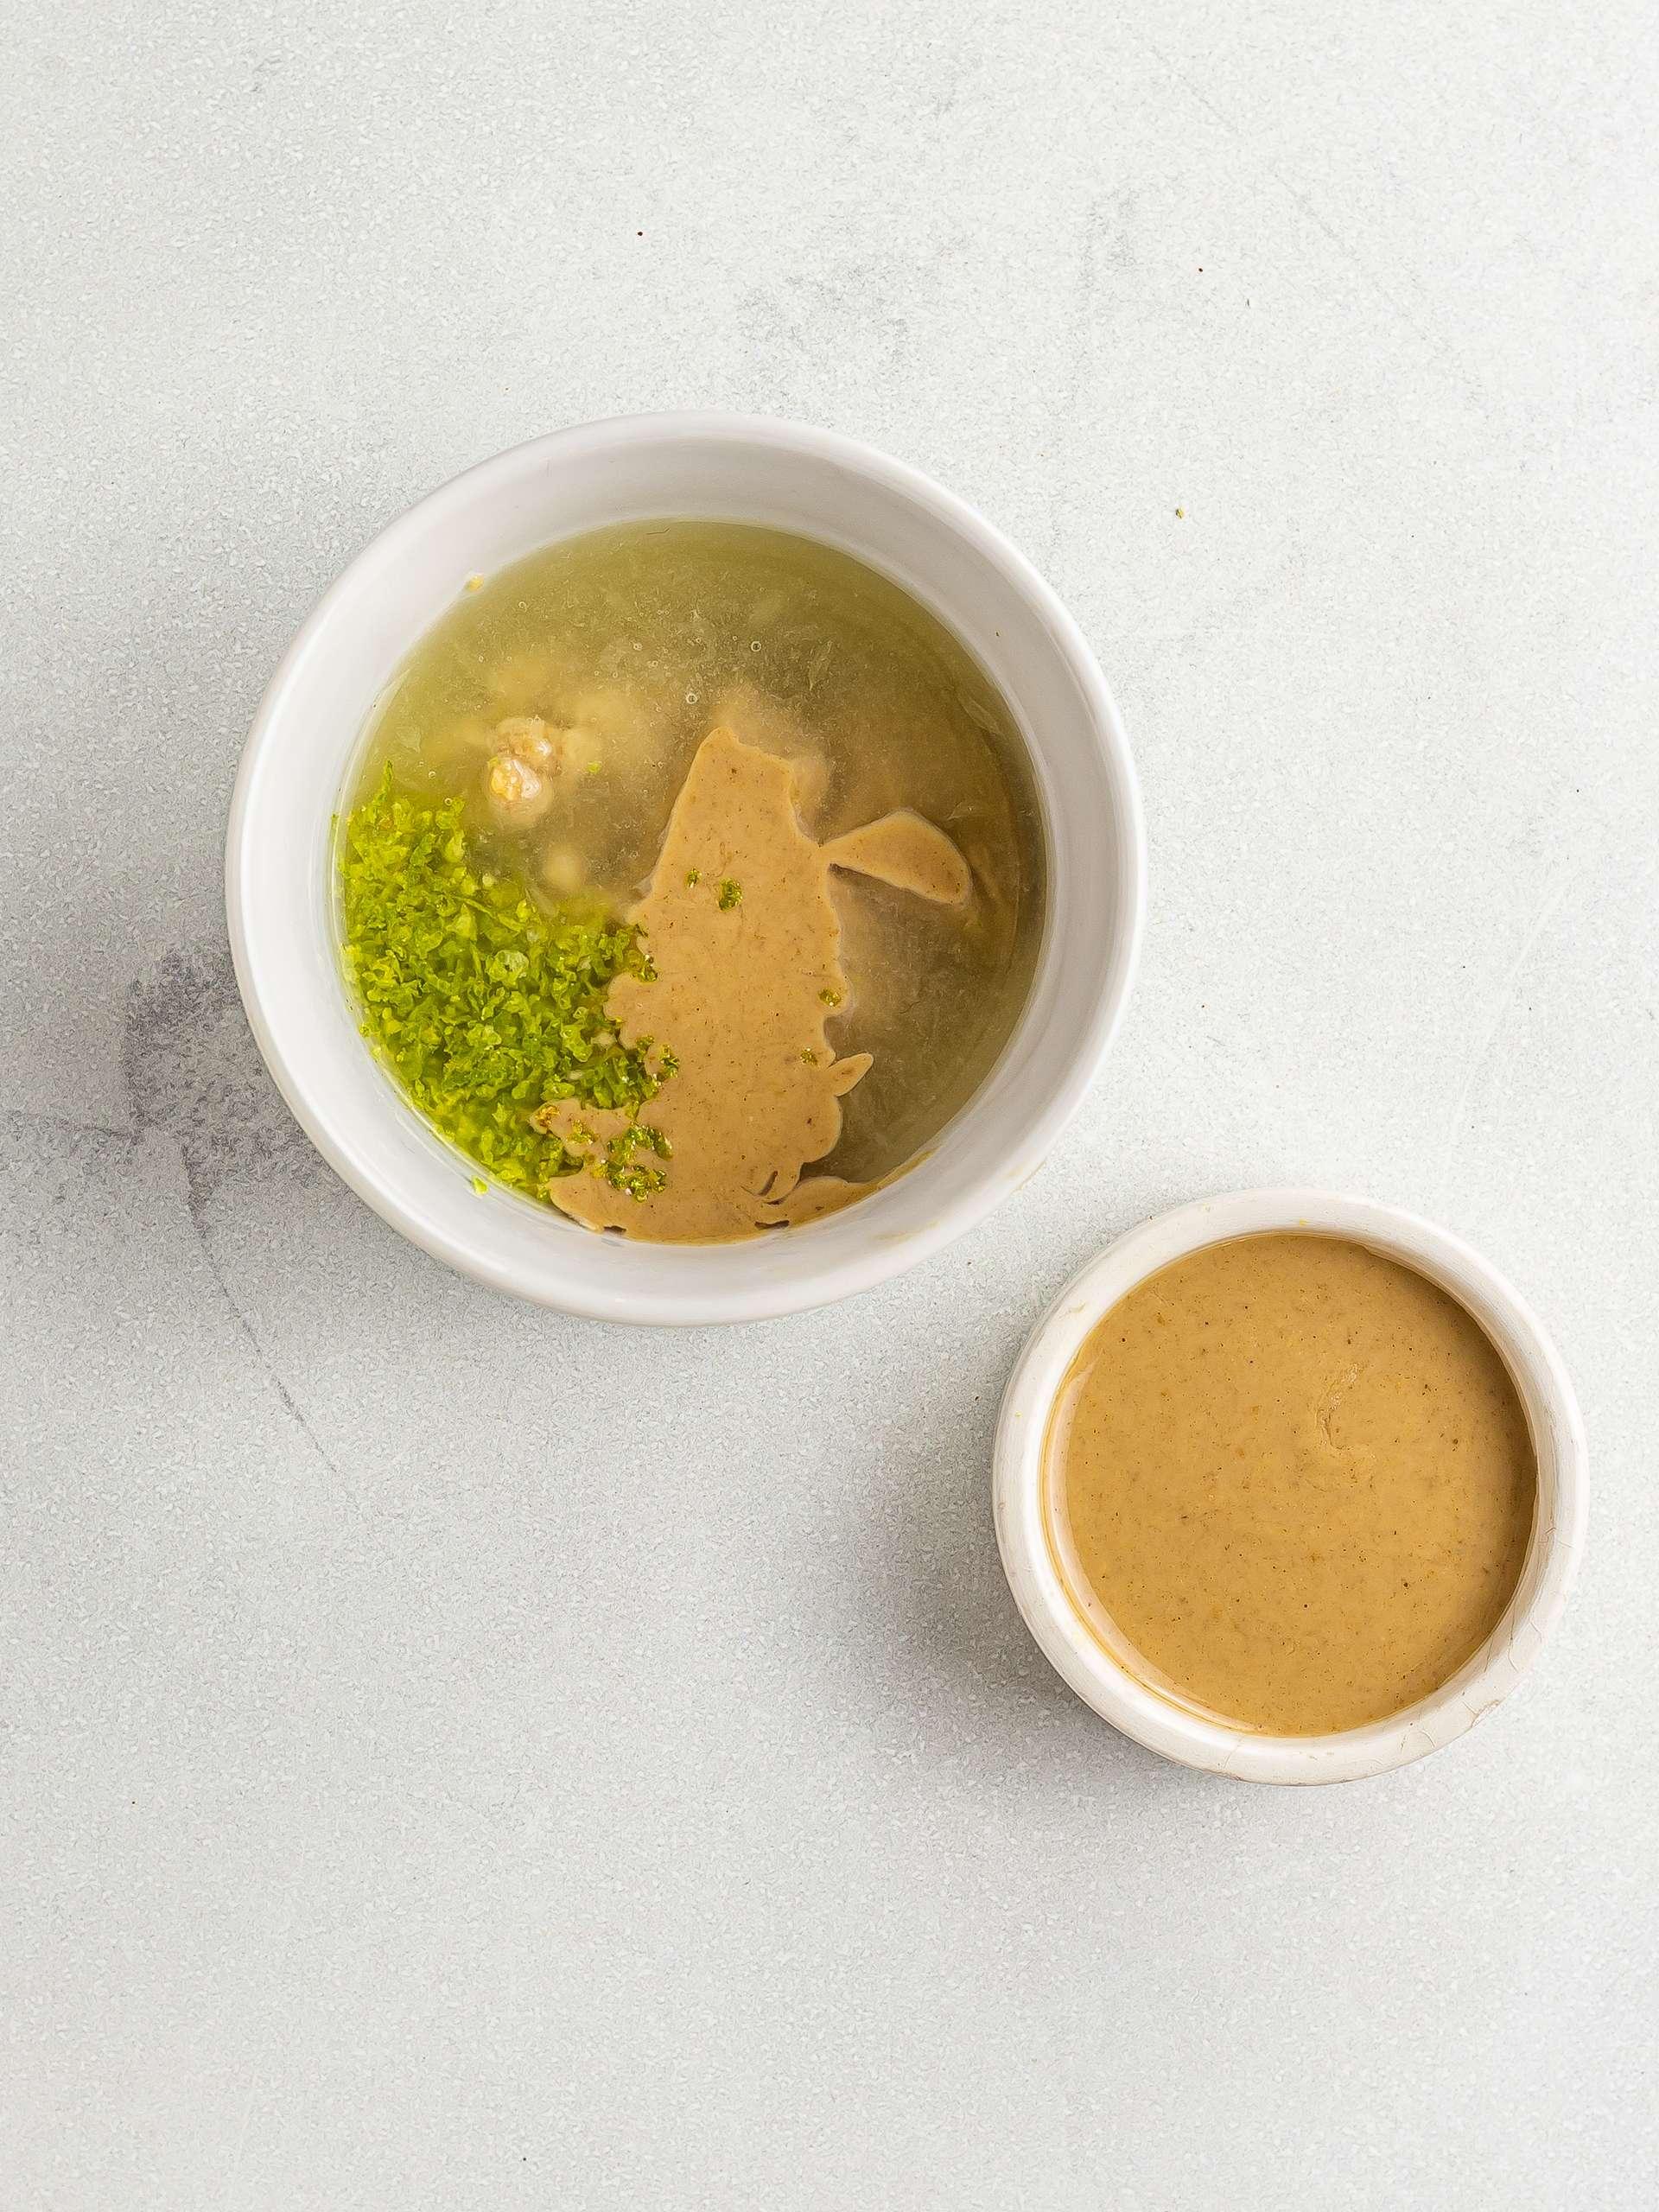 lime juice dressing with tahini